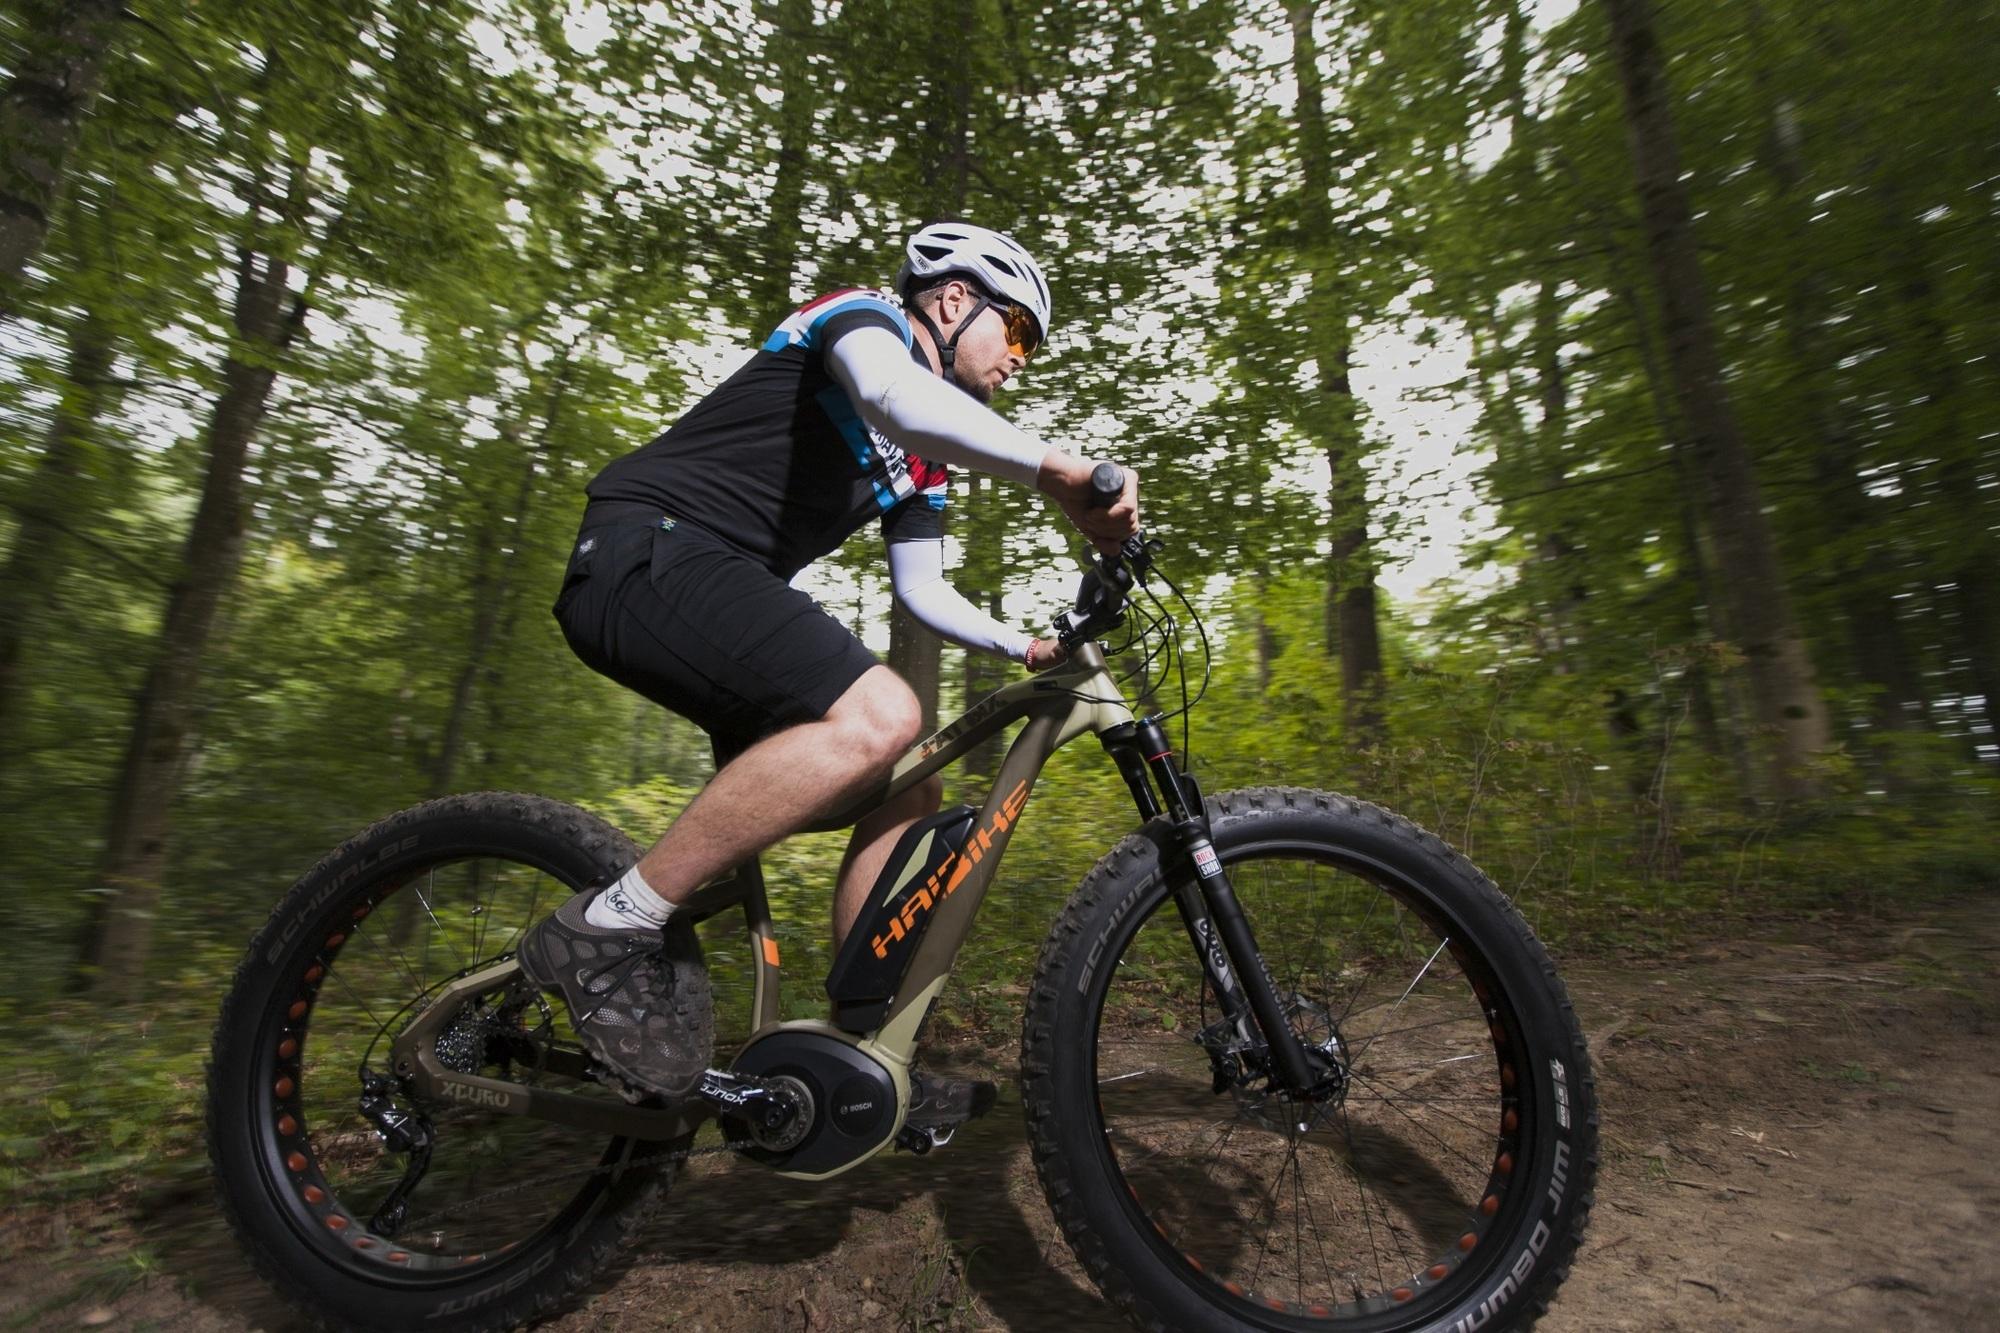 Fahrradtrends 2015 - Nachhilfe für harte Jungs